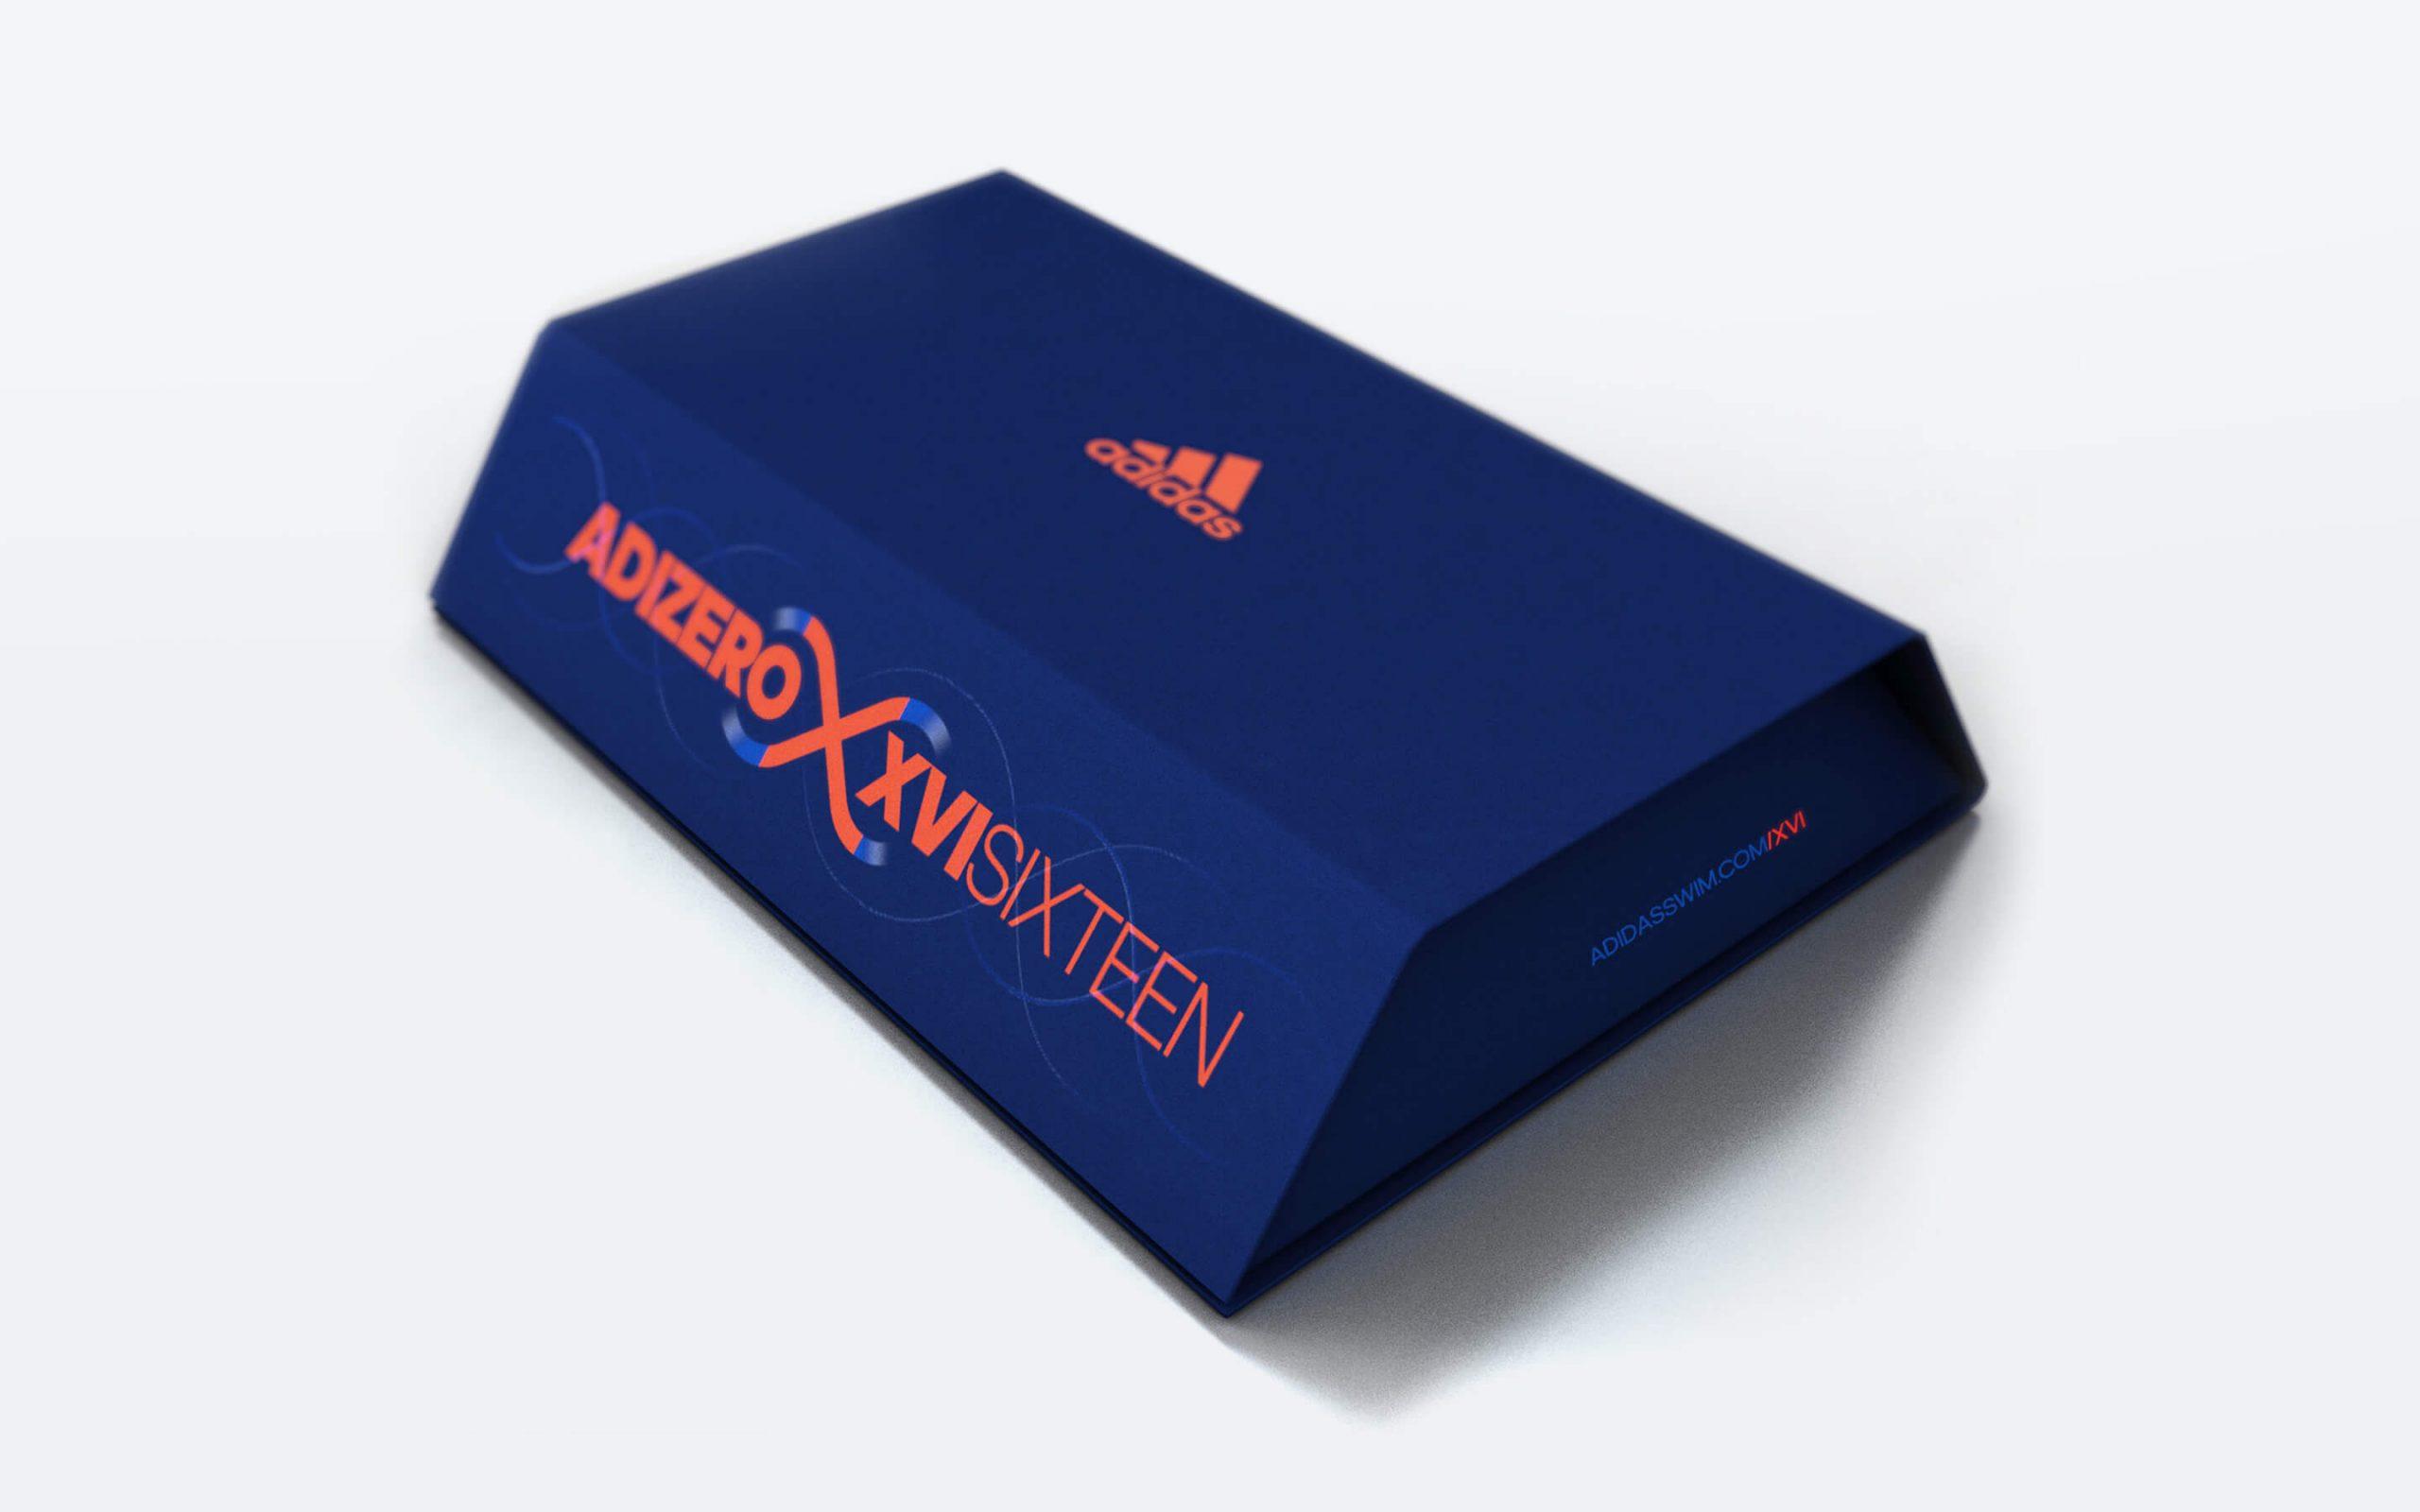 pascher-heinz-adidas-swim-adizero-xvi-packaging-01